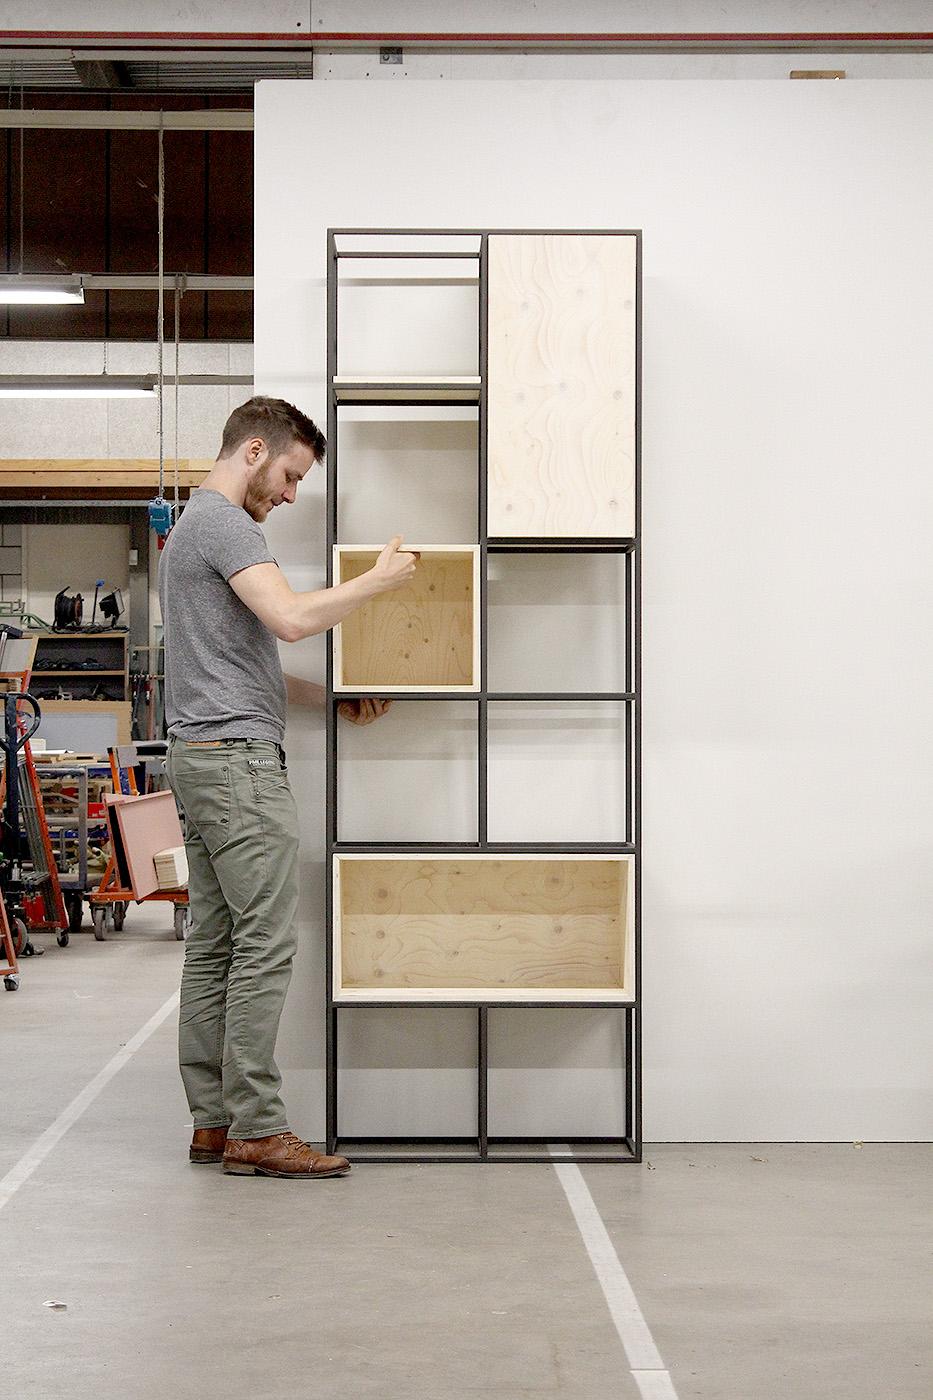 Light Plywood | From the Van Vliet workshop photo series